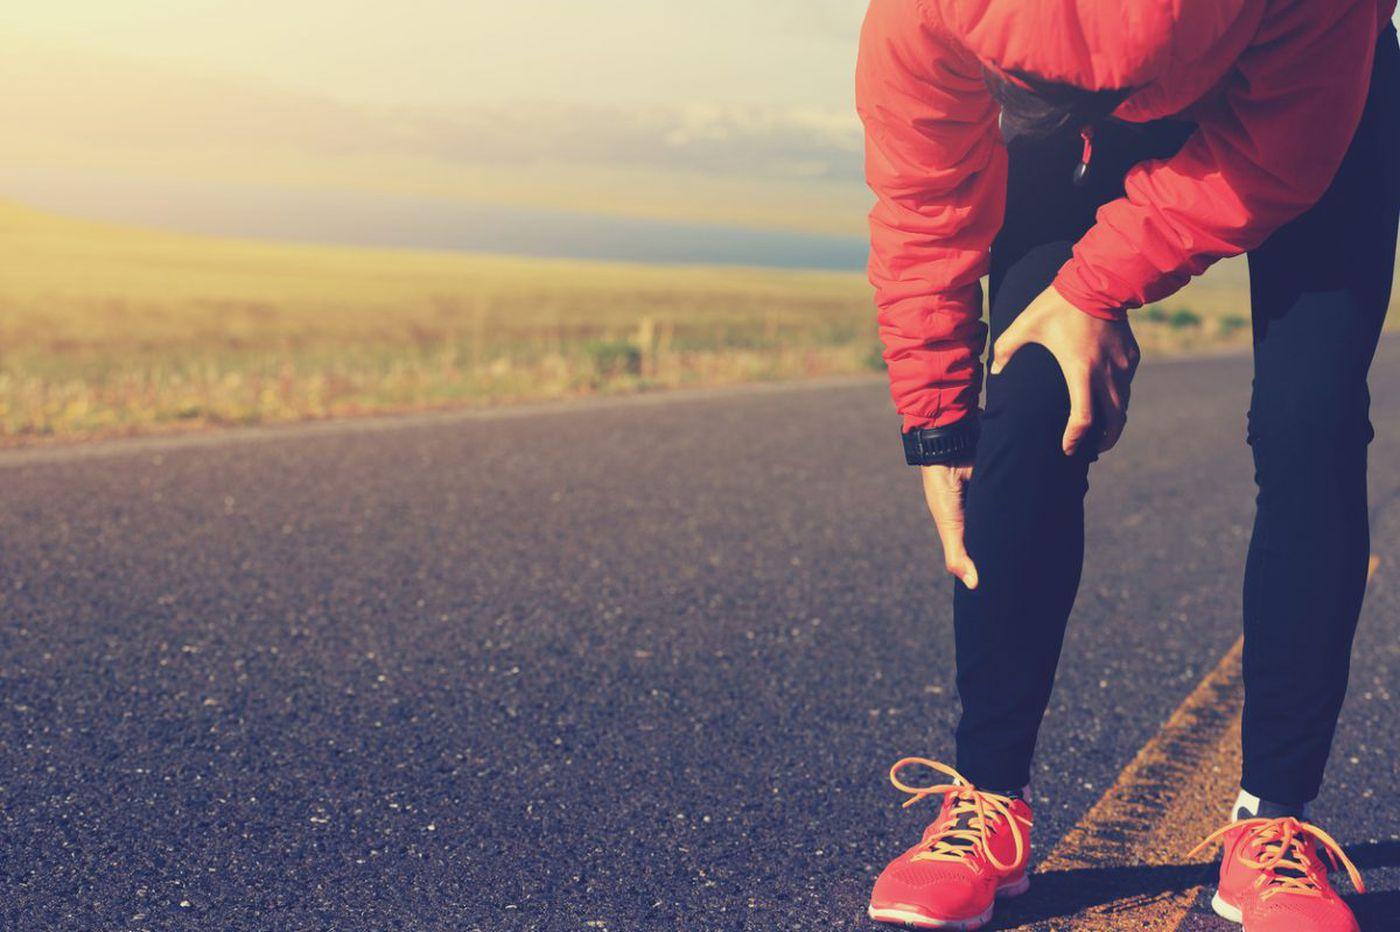 90 Percocets for a sore knee? Despite addiction fears, high prescribing persists